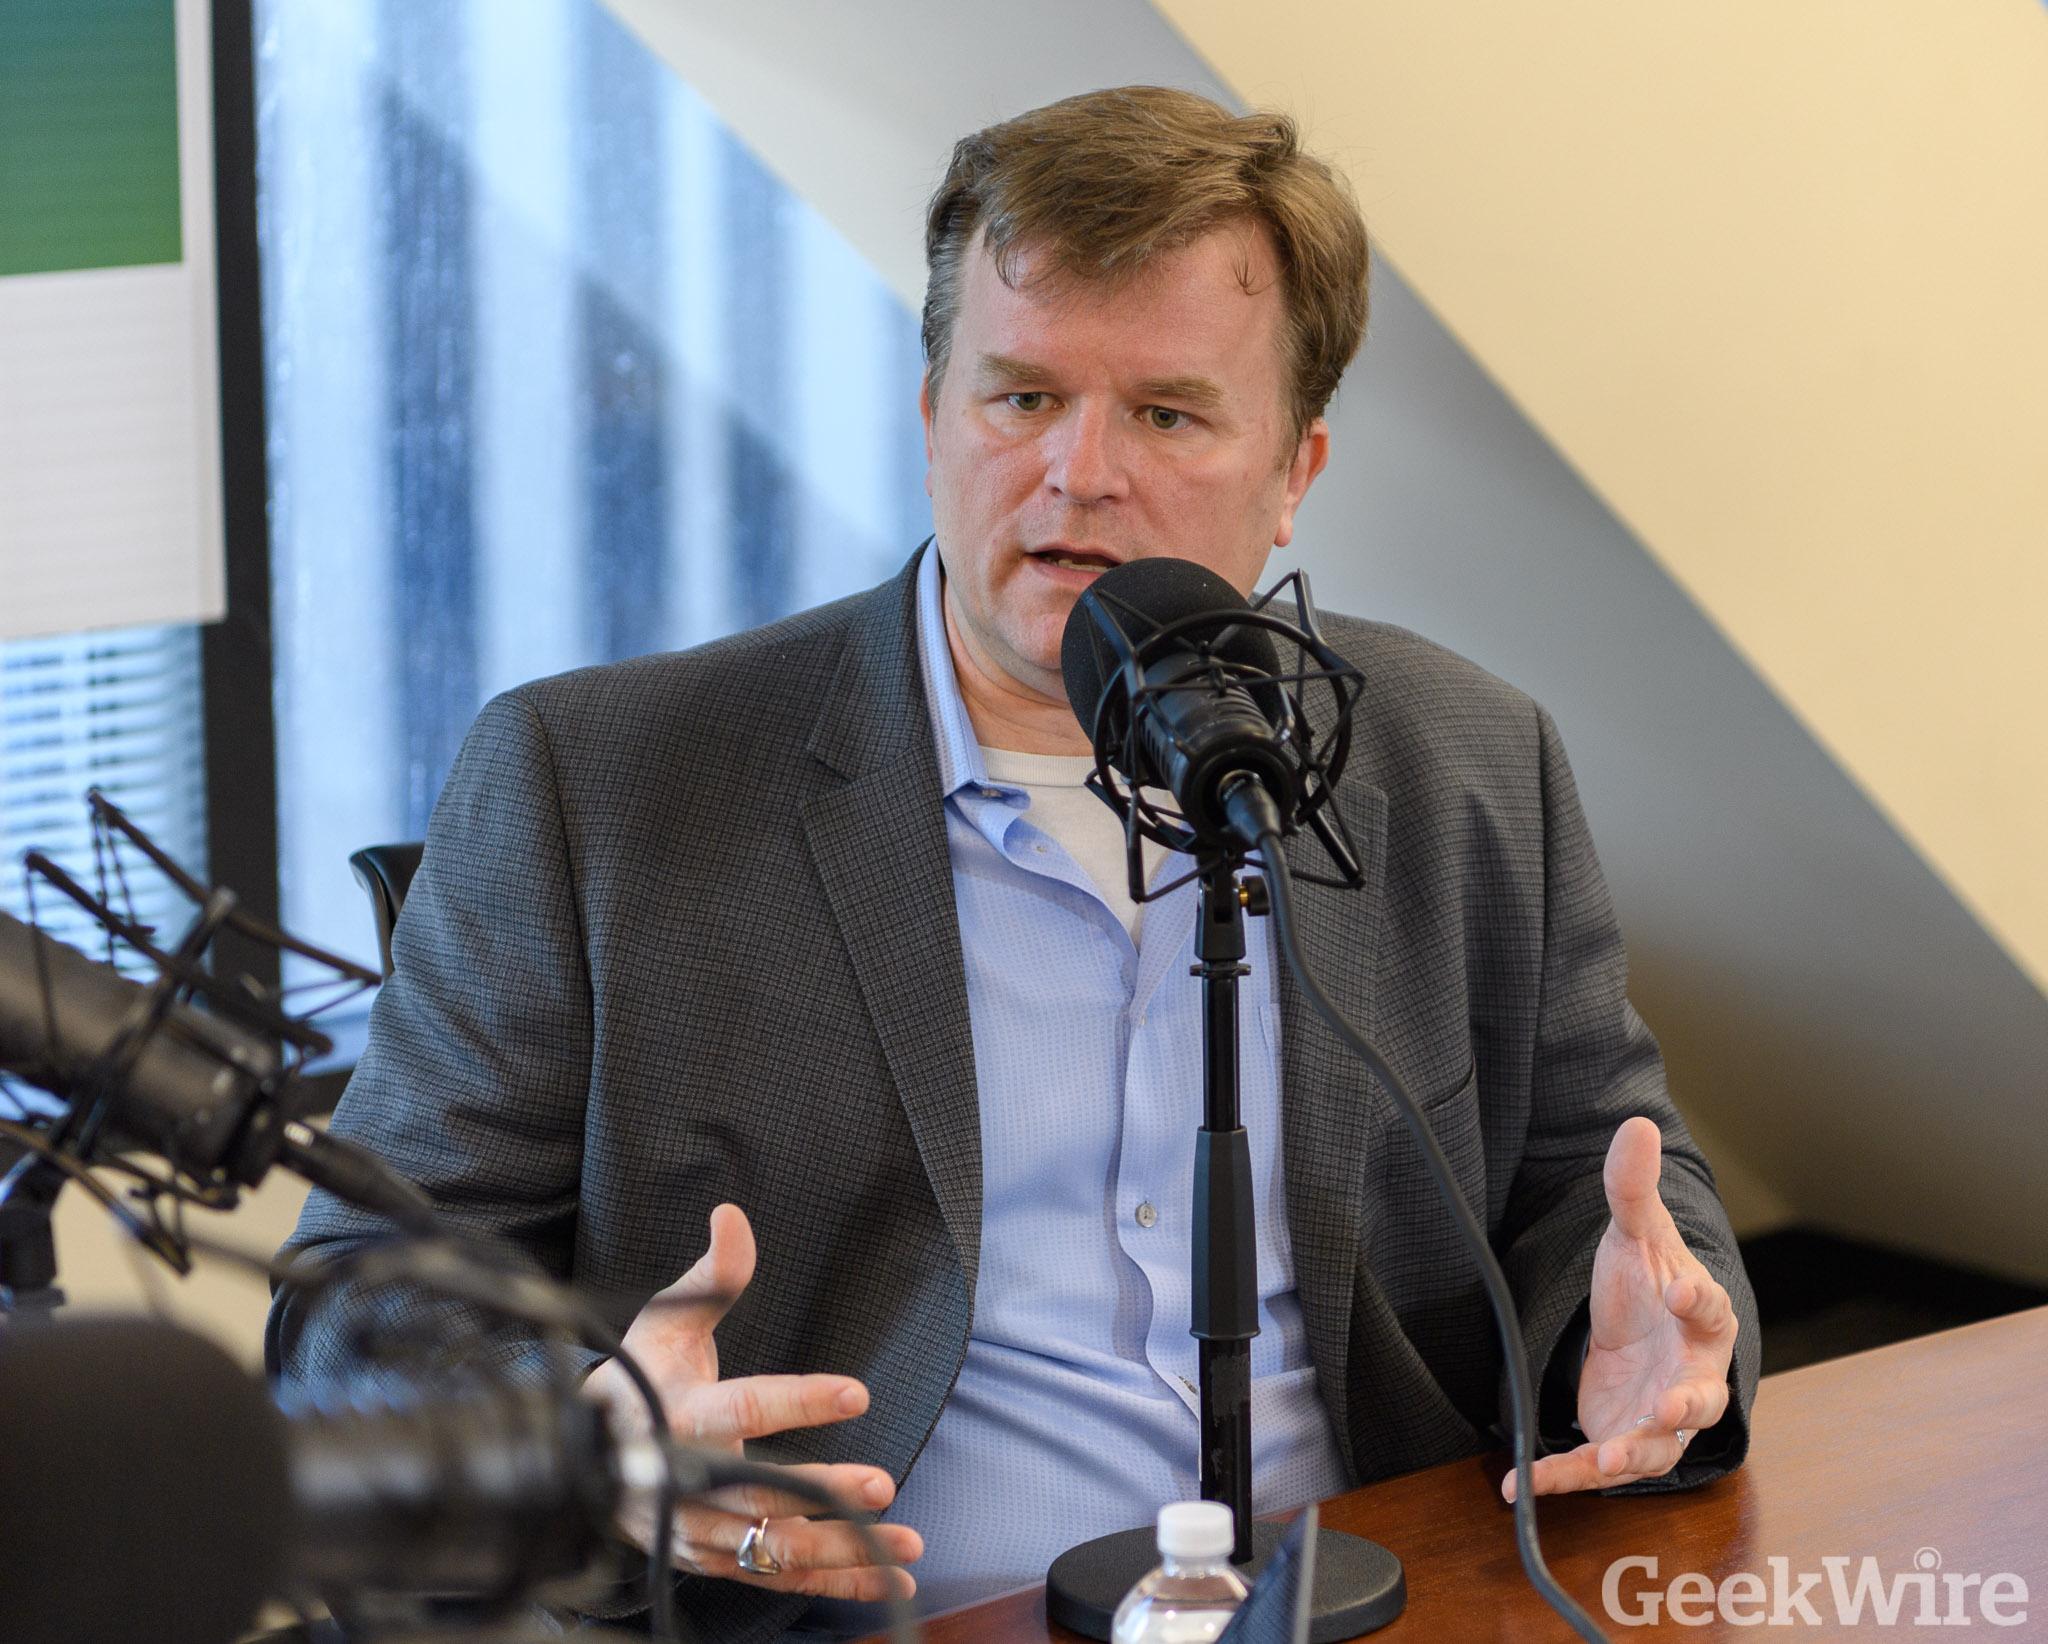 After heated Reddit AMA, Providence Health digital unit confirms